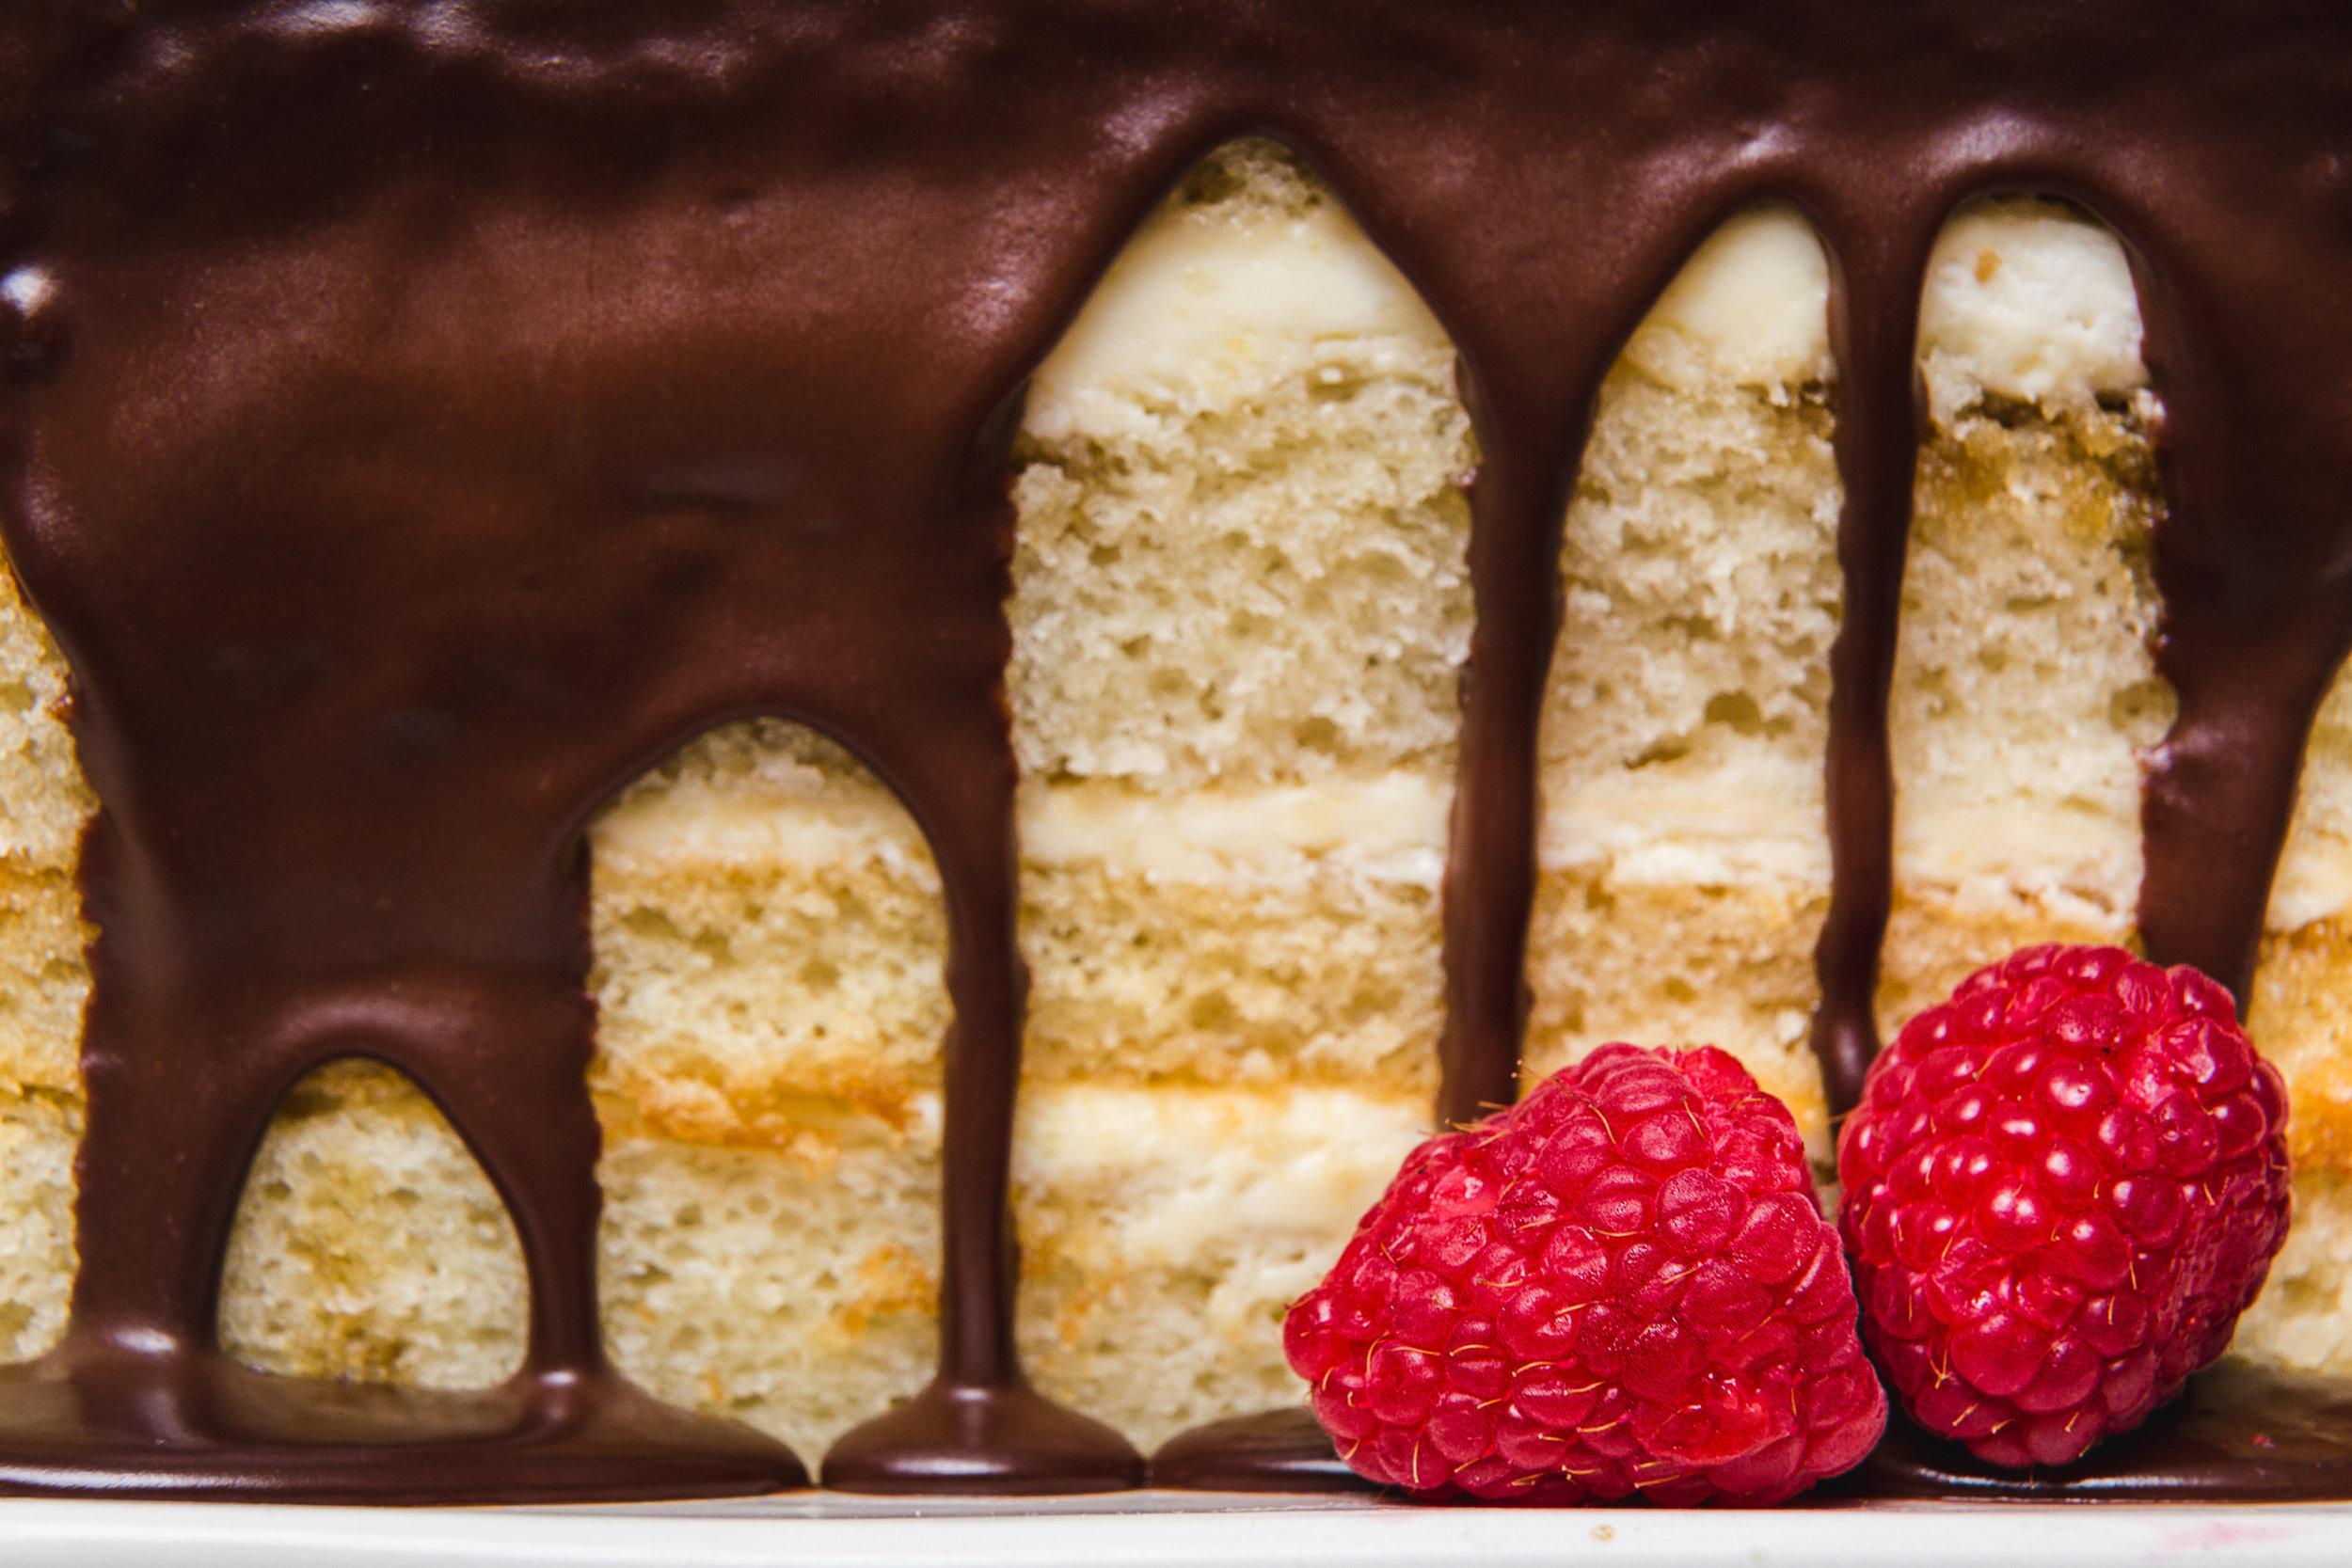 Boston Cream Pie Garnished with Plump Raspberries